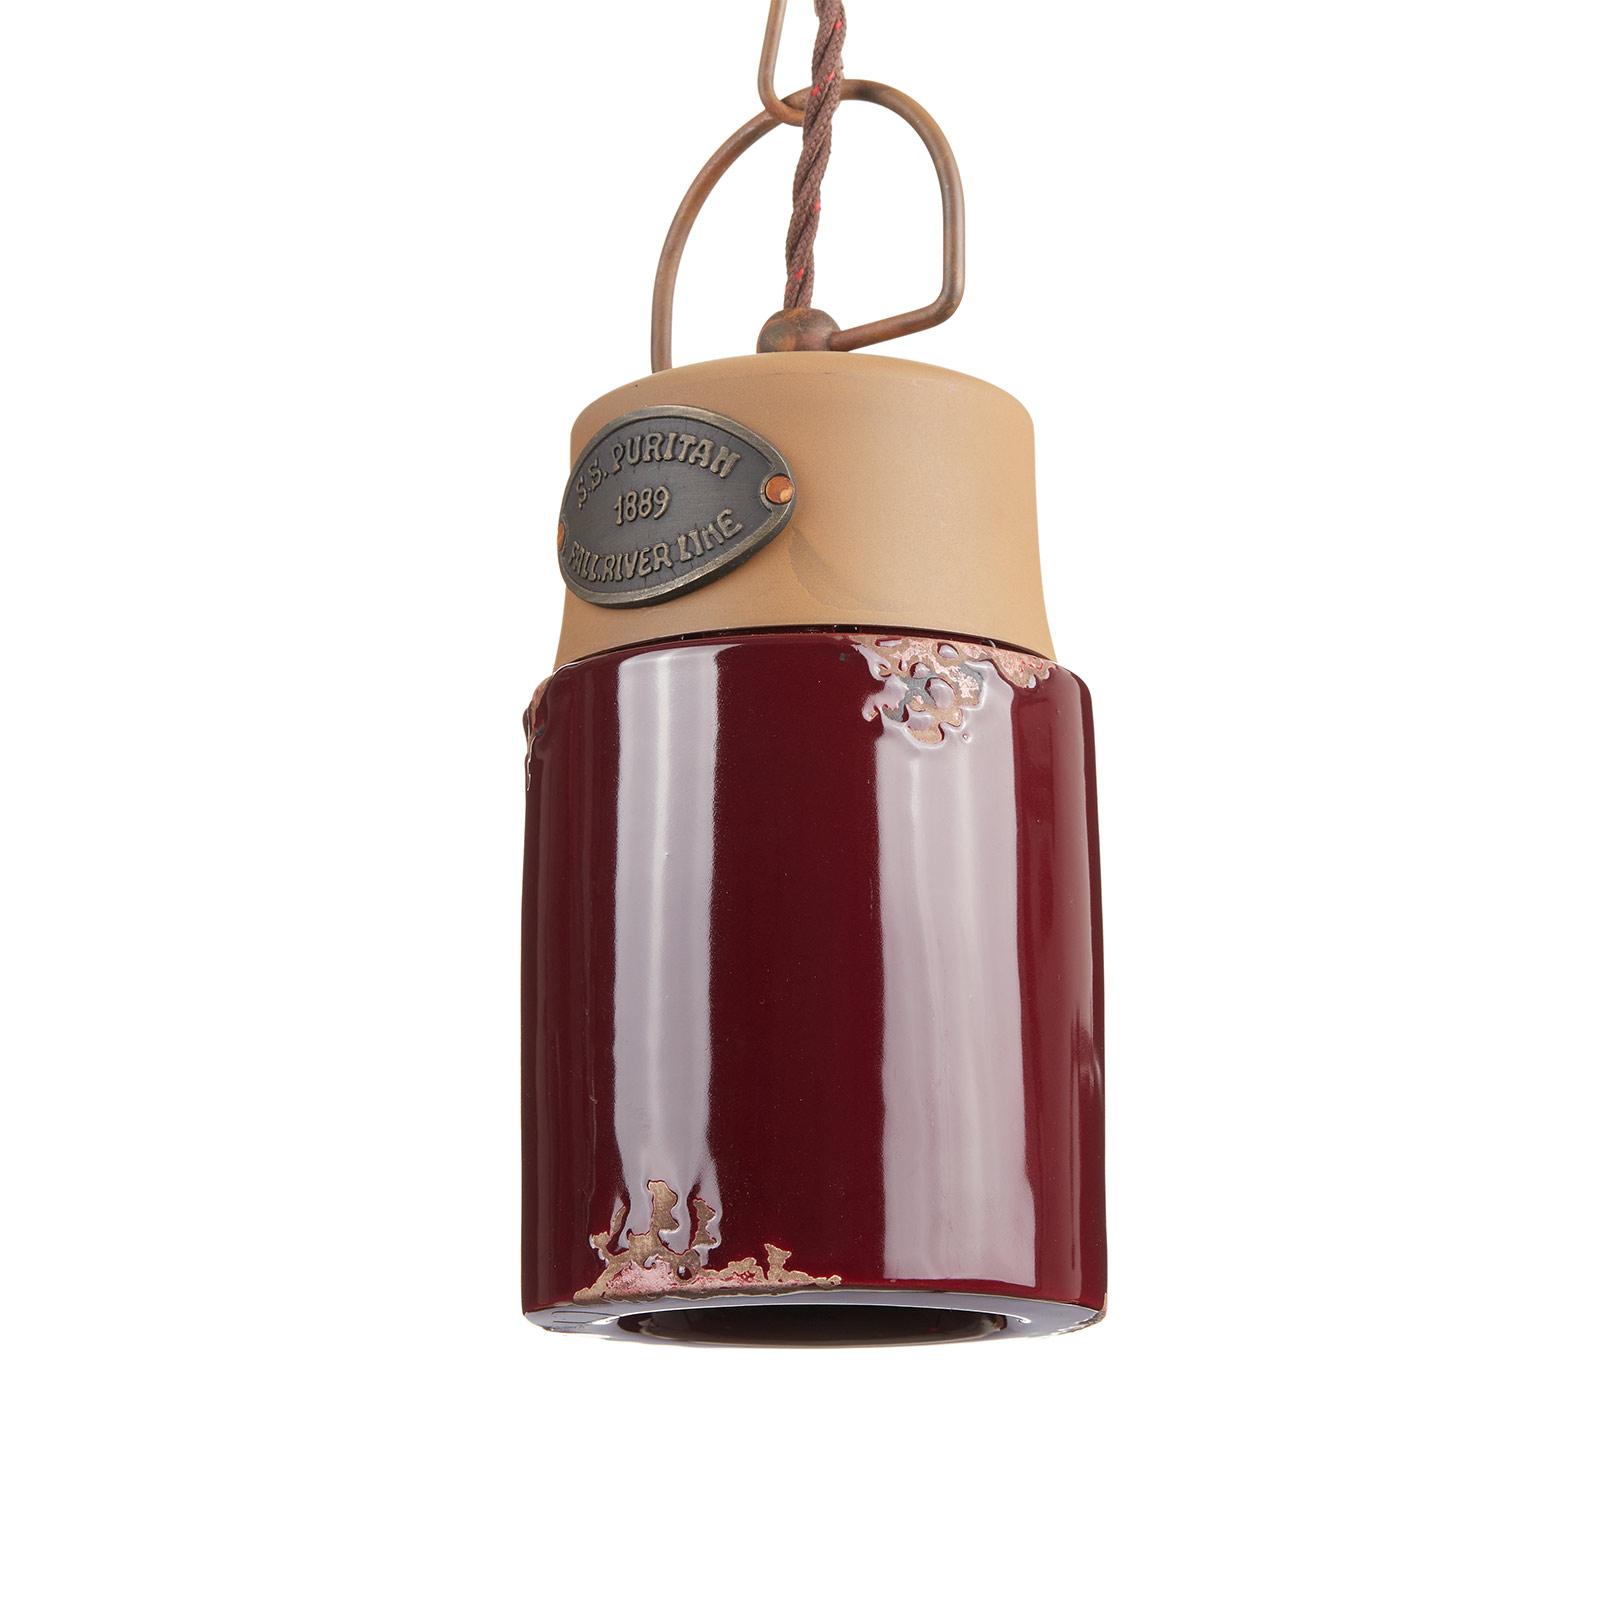 Hanglamp C1620, keramiek en metaal, bordeaux